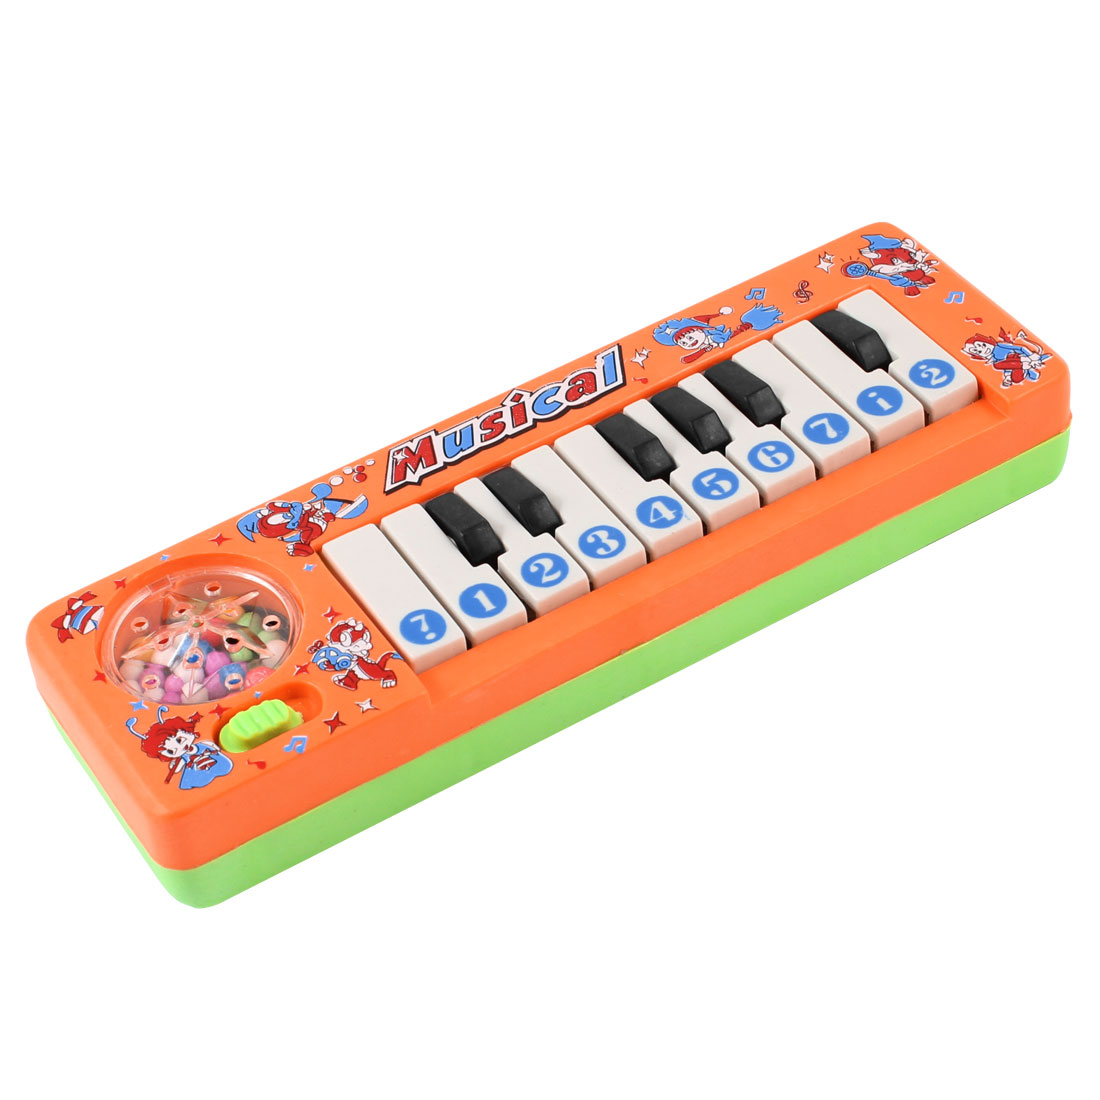 Powered Piano Keyboard Plastic Electronic Organ Toy Orange